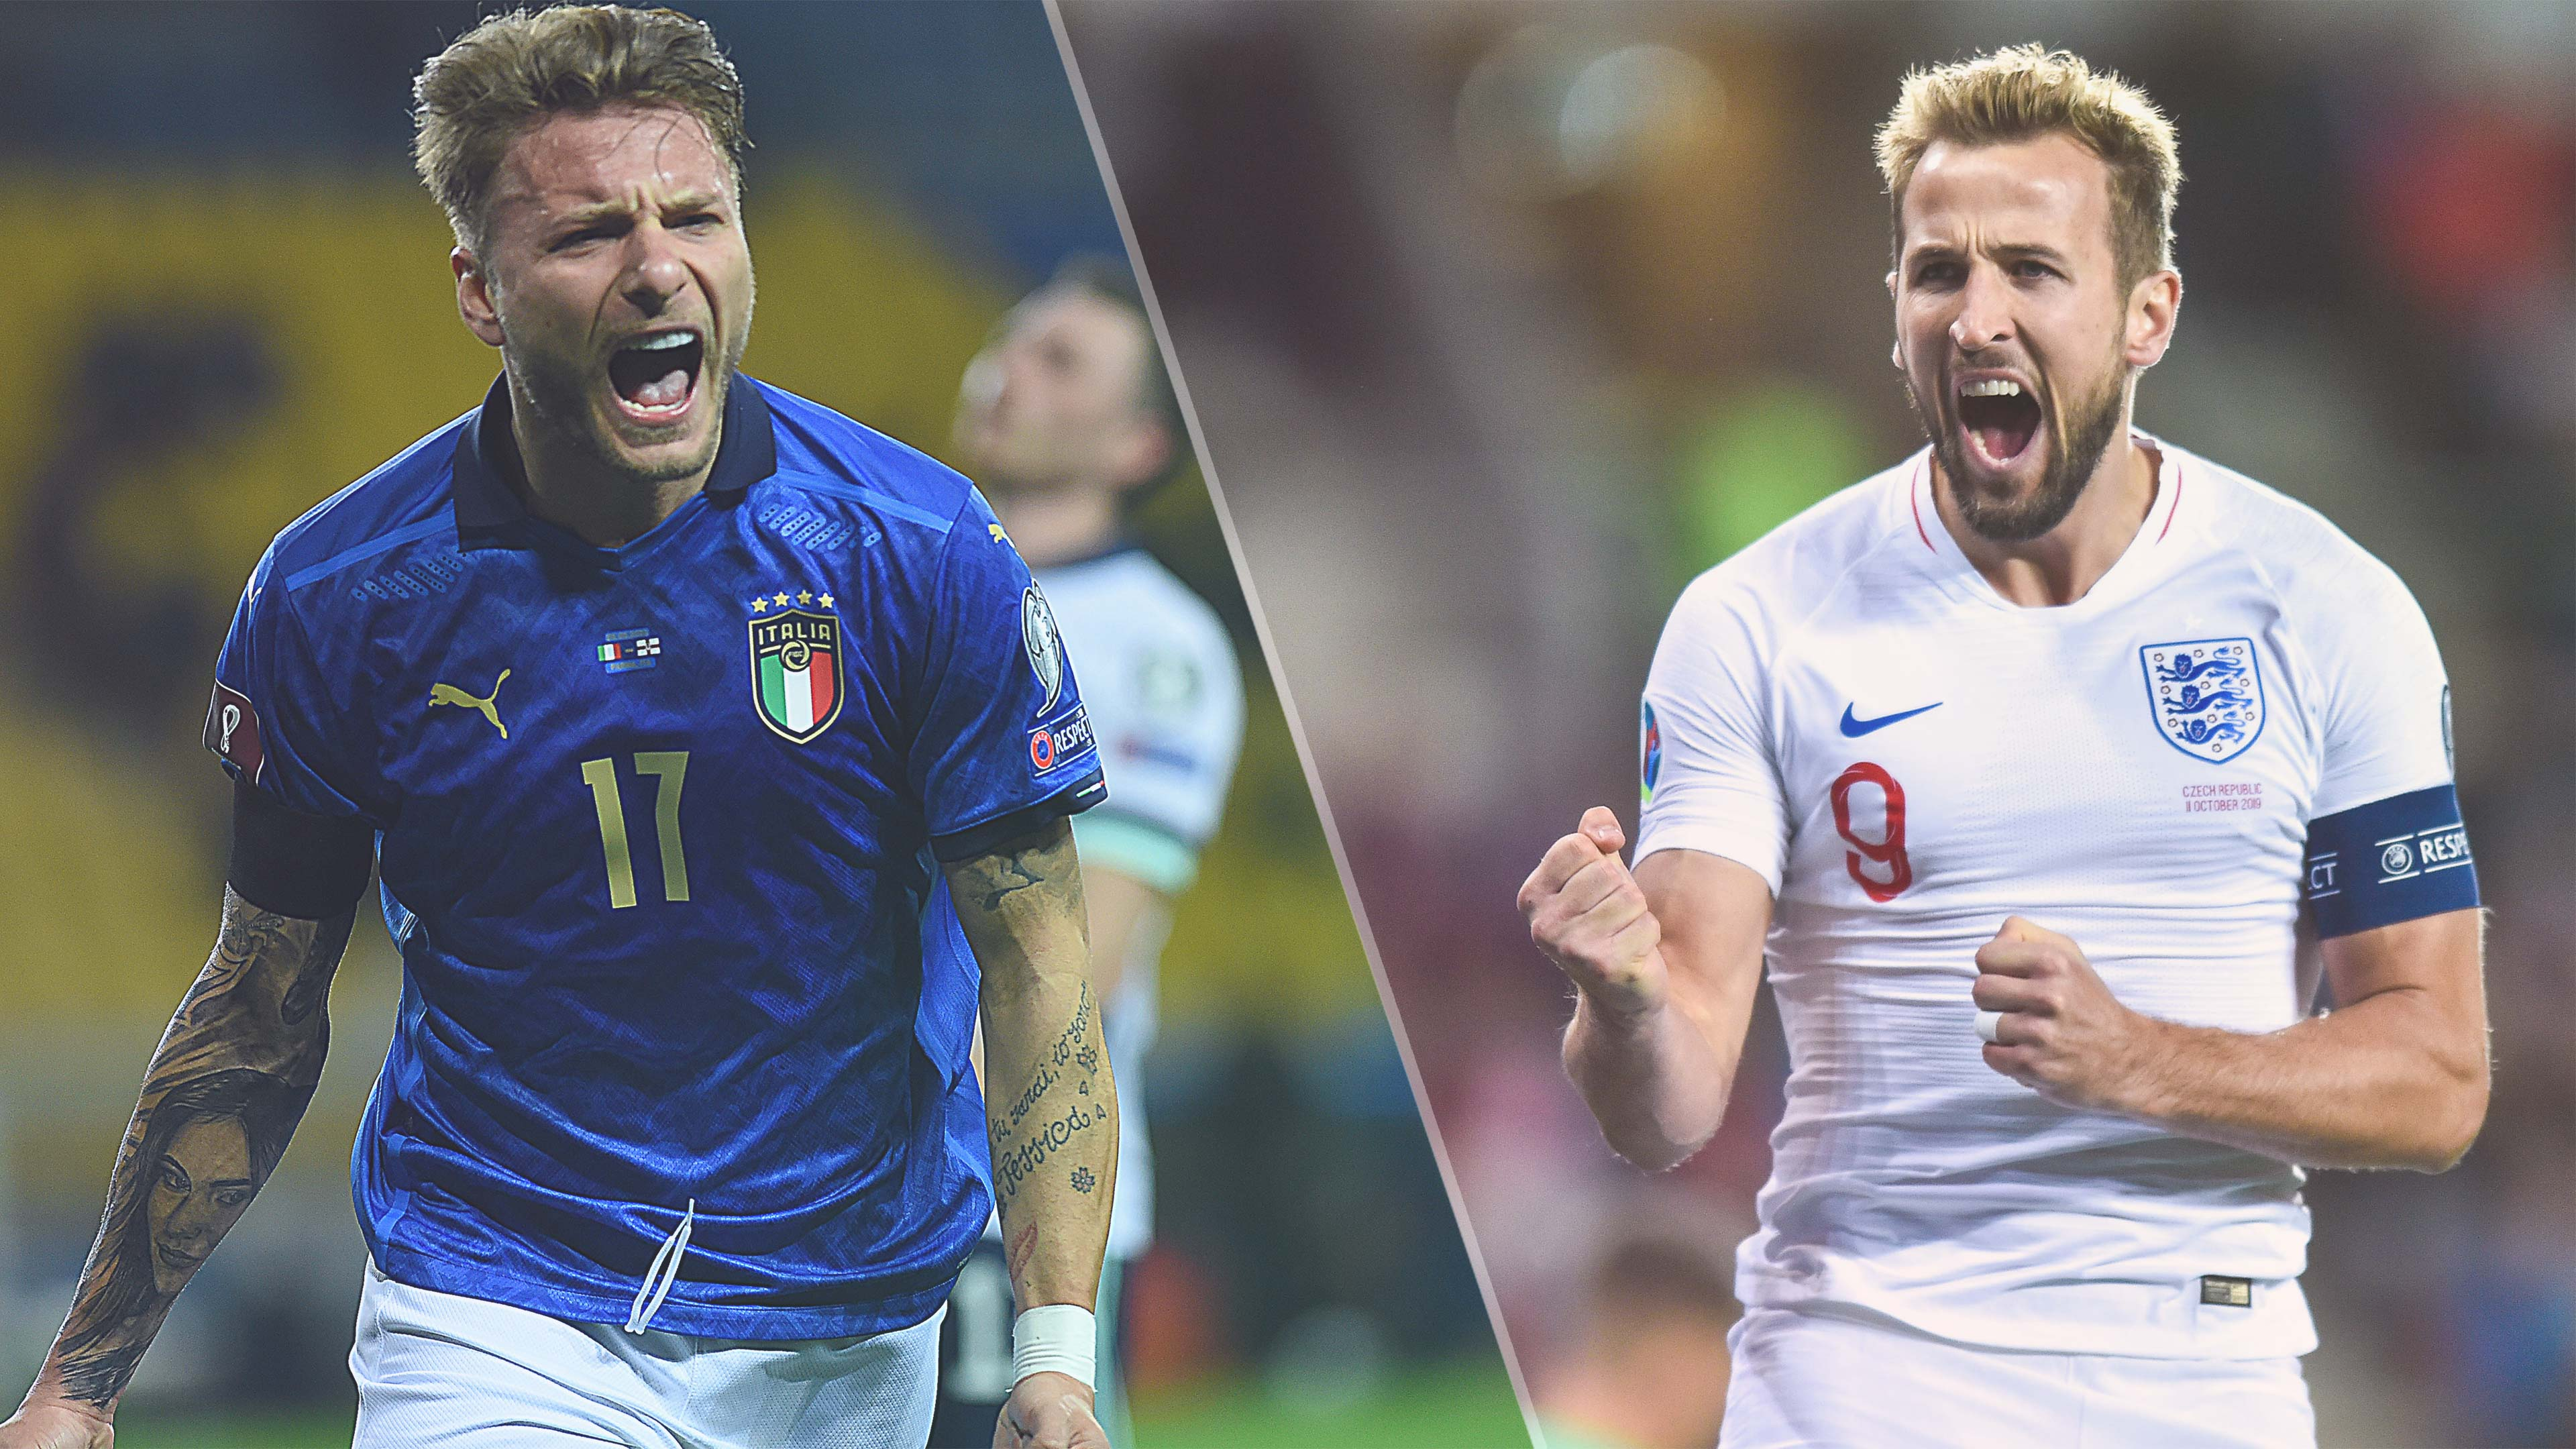 Euro 2020 Final preview: England v Italy